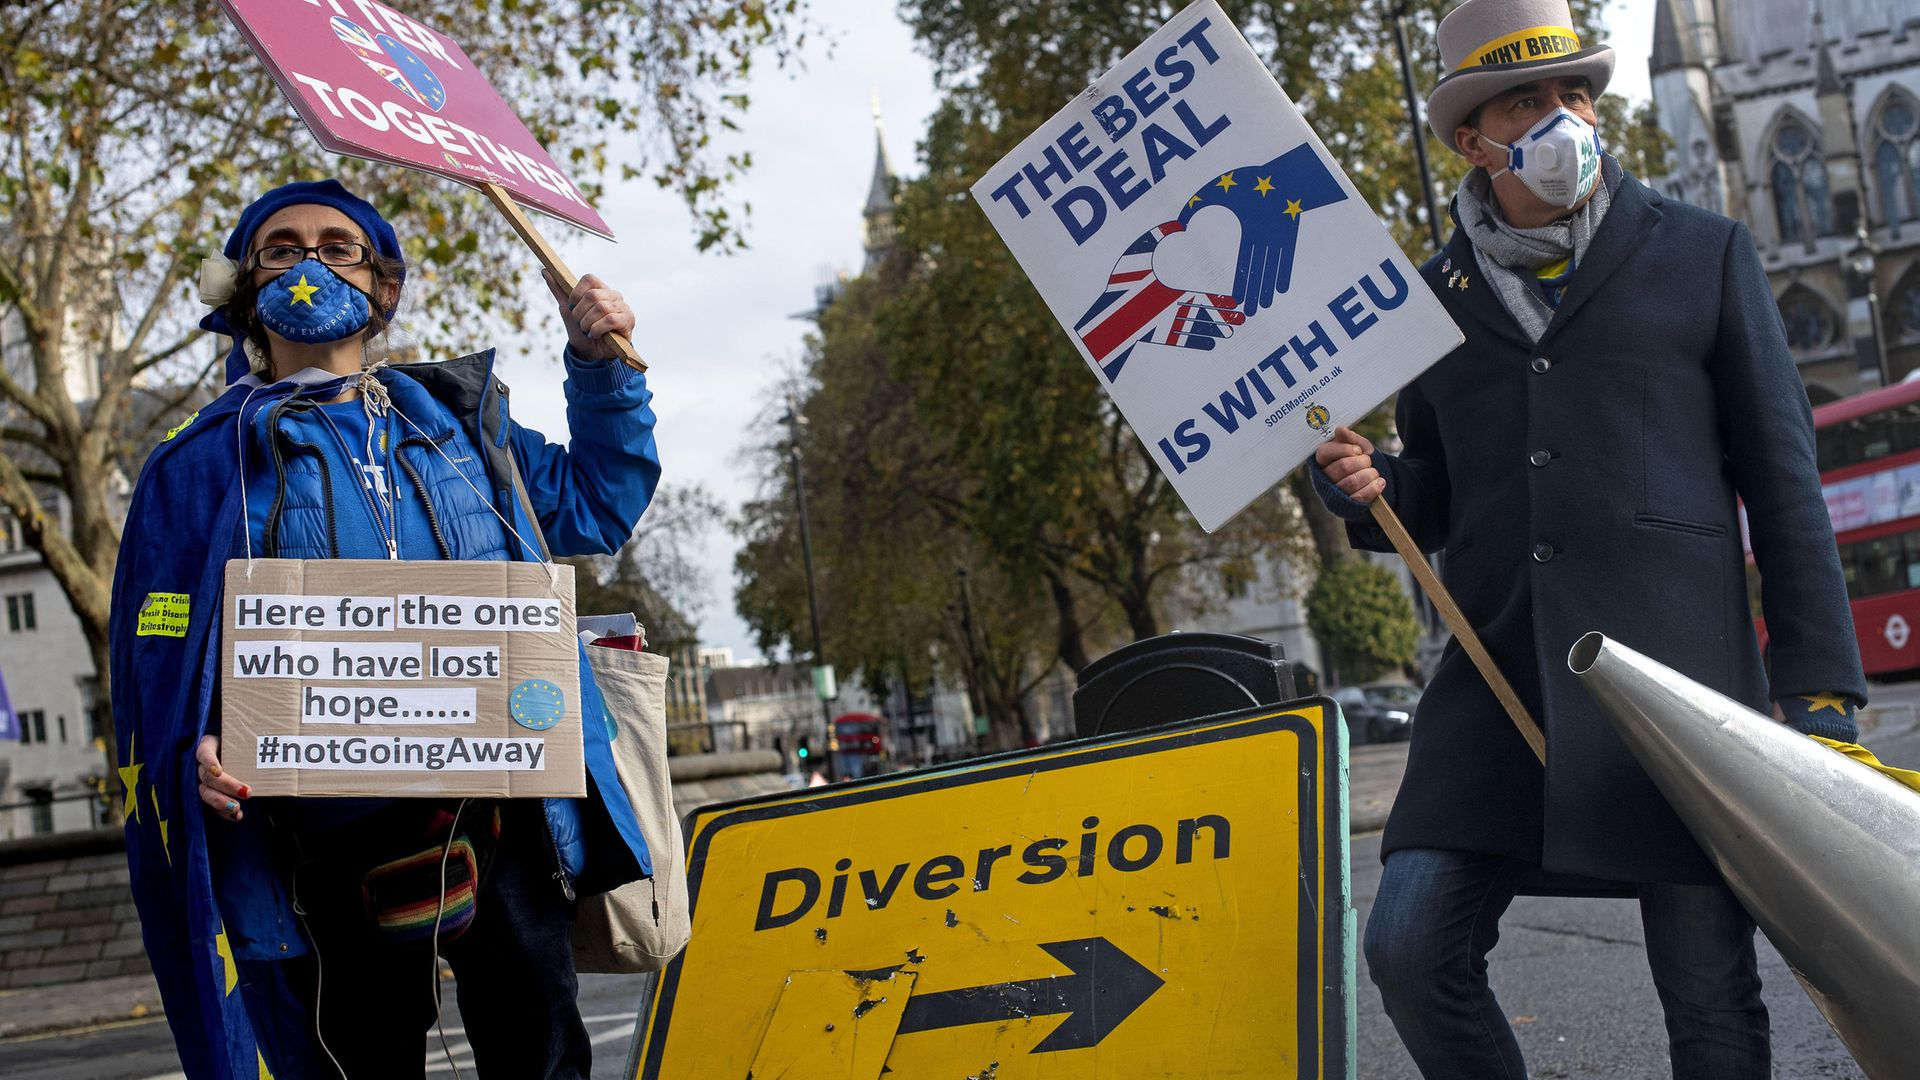 Anti-Brexit demonstrators in Westminster, London. - Credit: PA